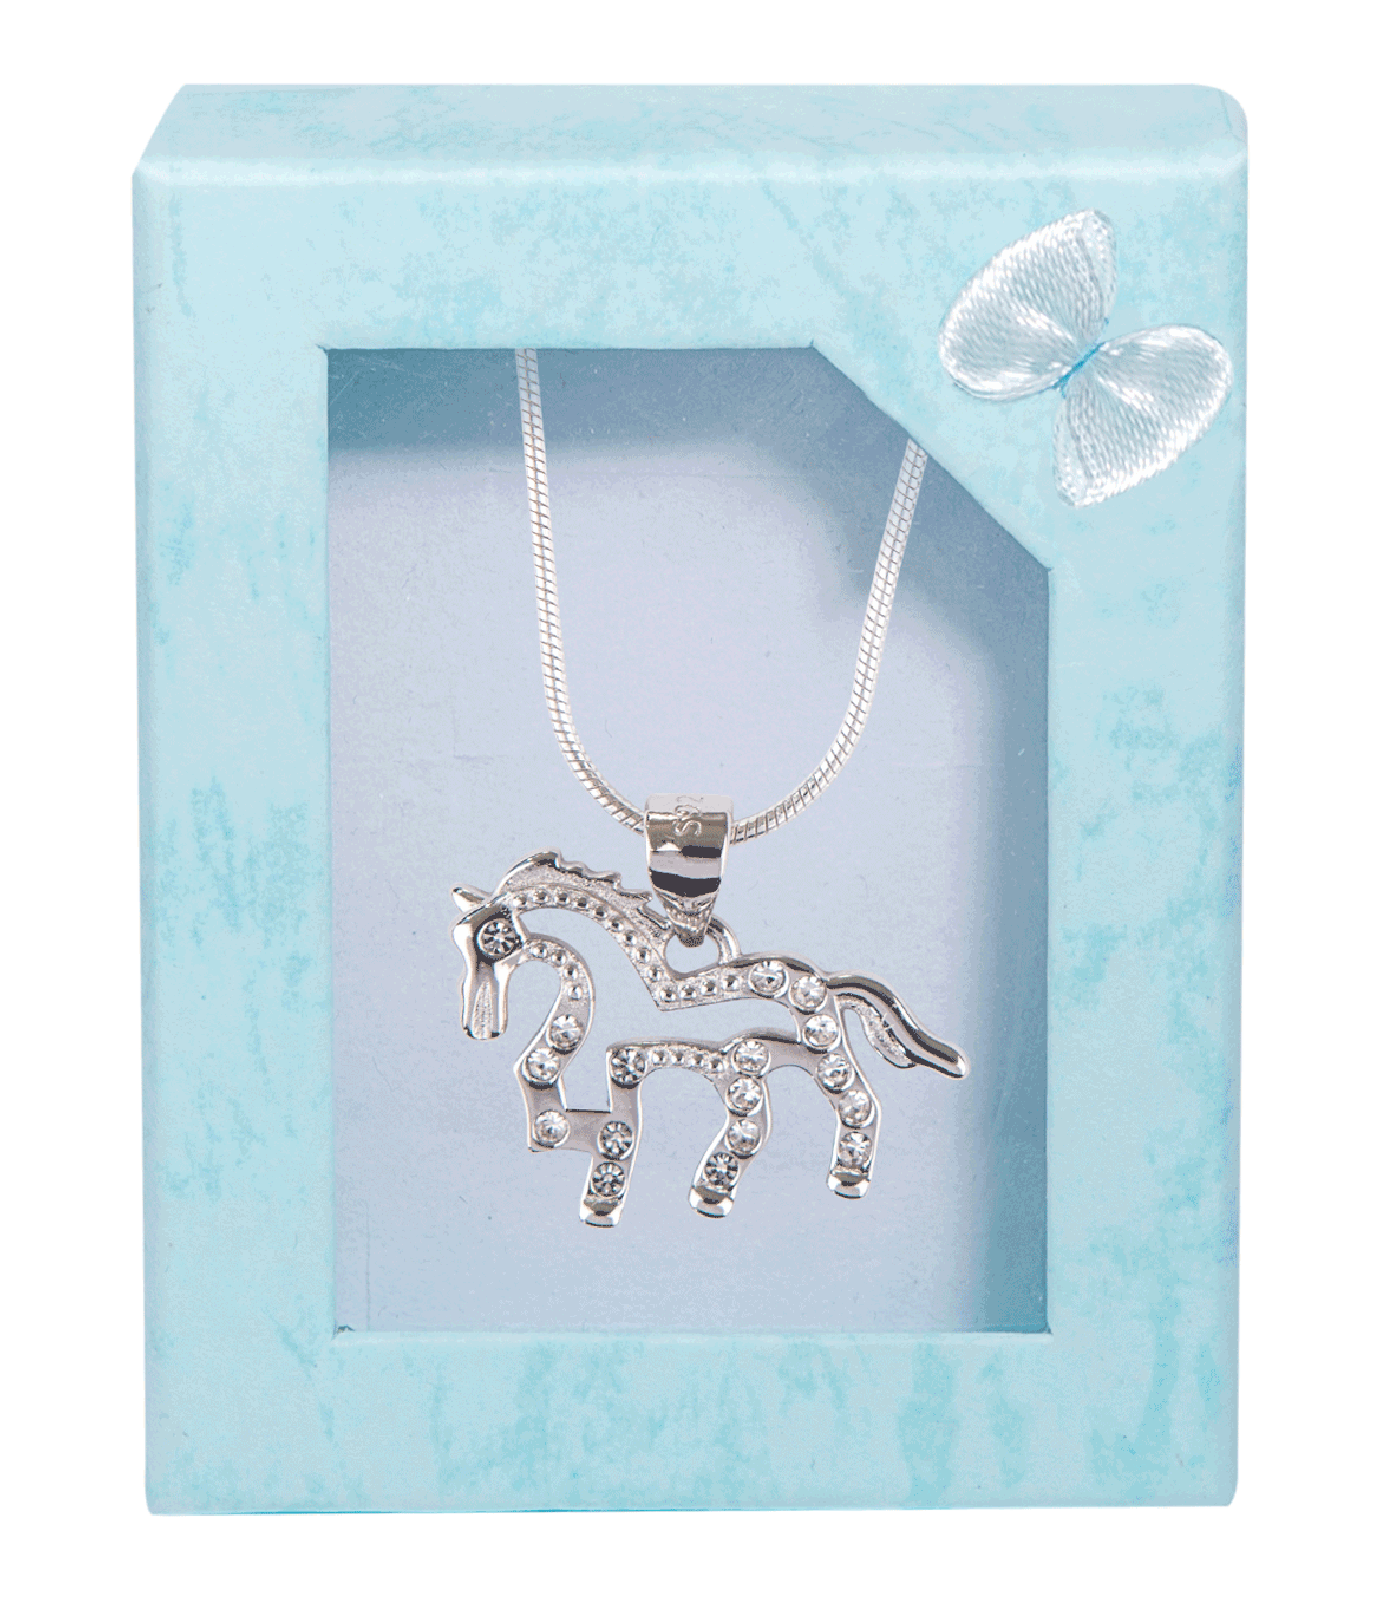 Halskette Pferd 925 Sterling-Silber